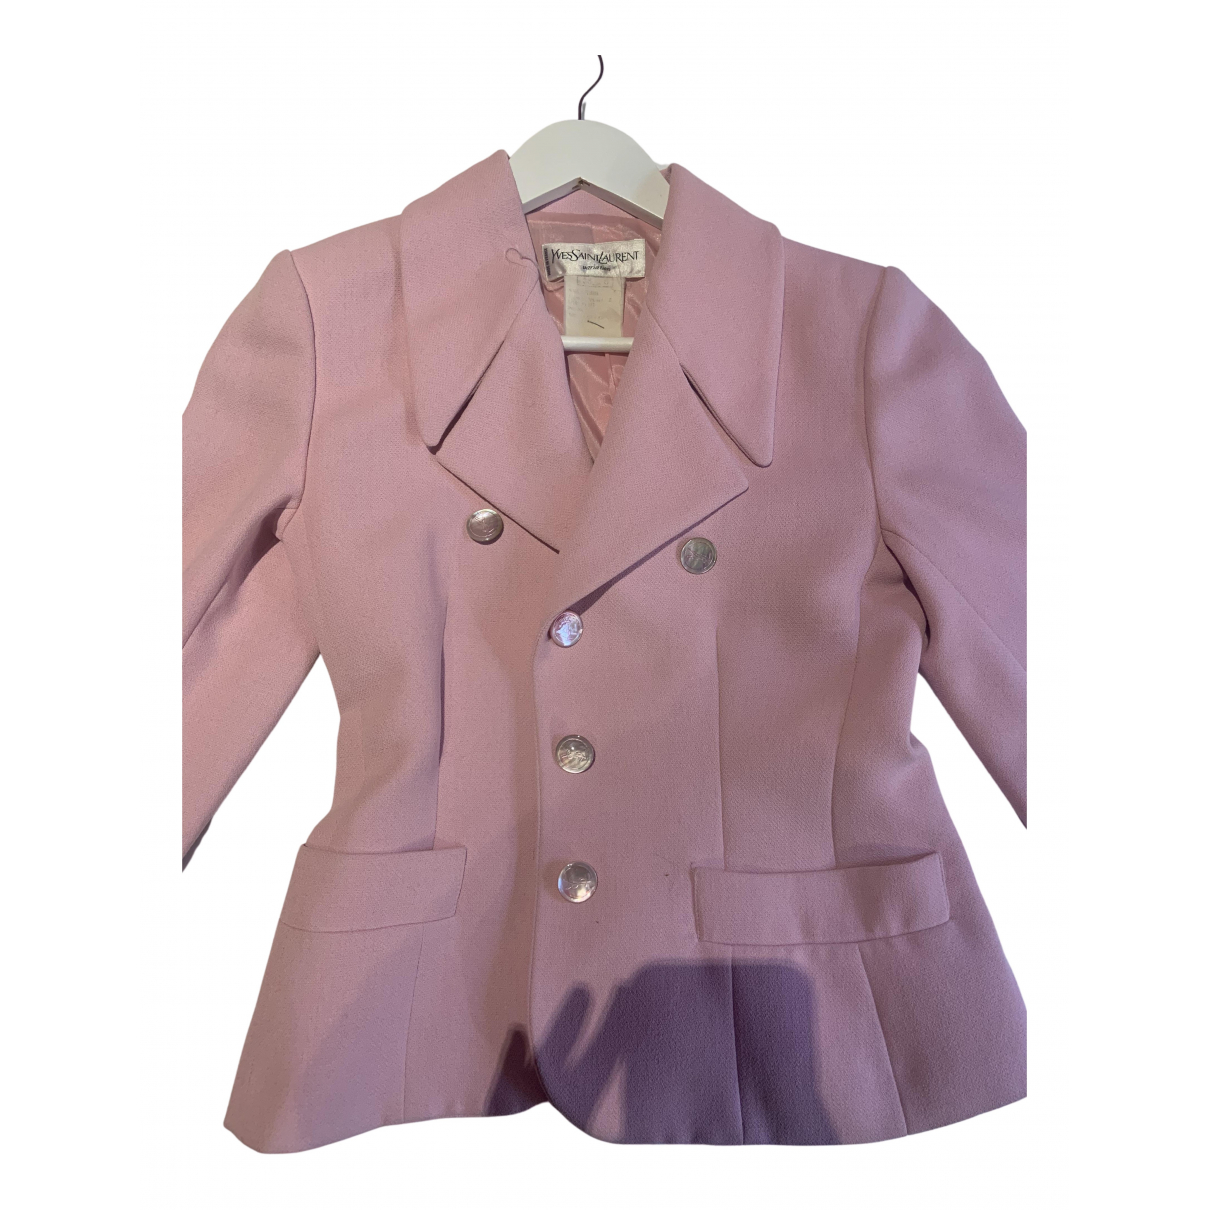 Yves Saint Laurent N Pink jacket for Women 38 FR